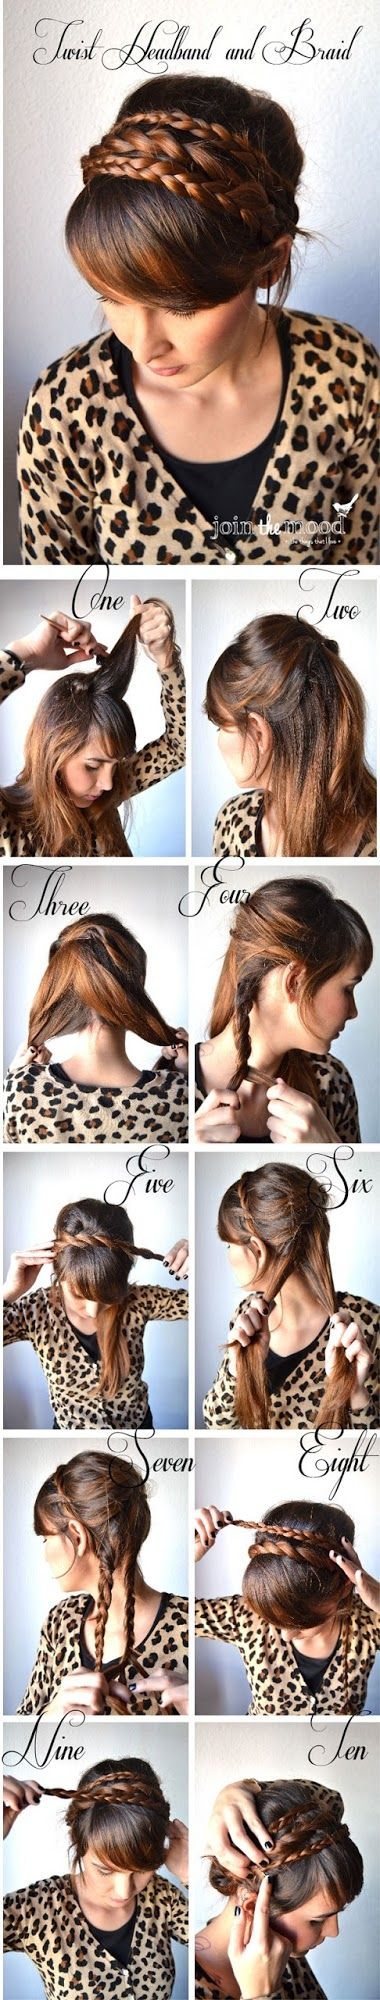 Buffant headband braid | Beauty tutorials